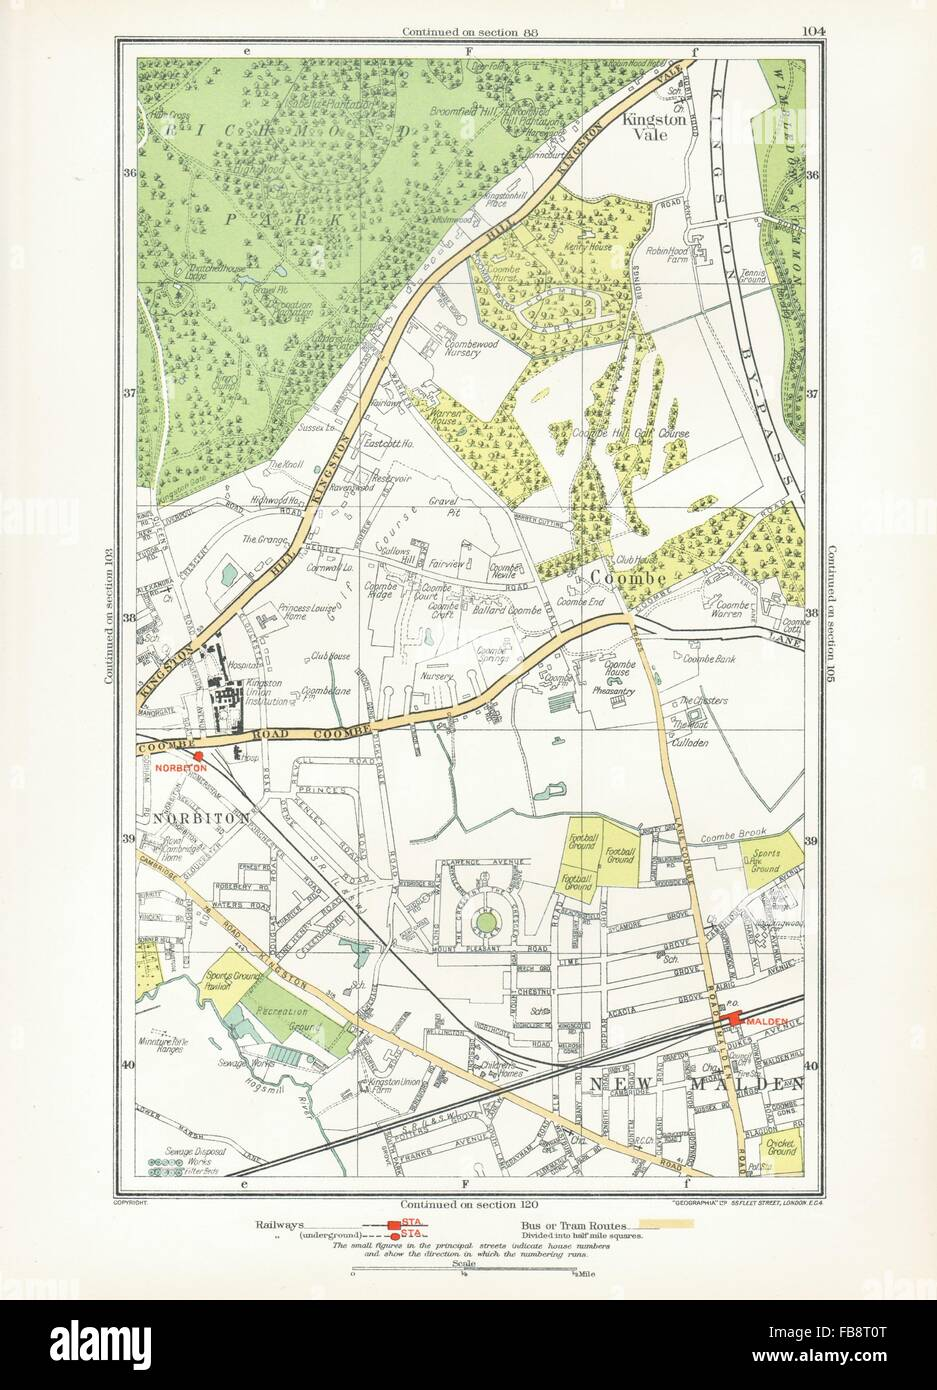 NORBITON Coombe Kingston Hill Kingston Vale New Malden Malden